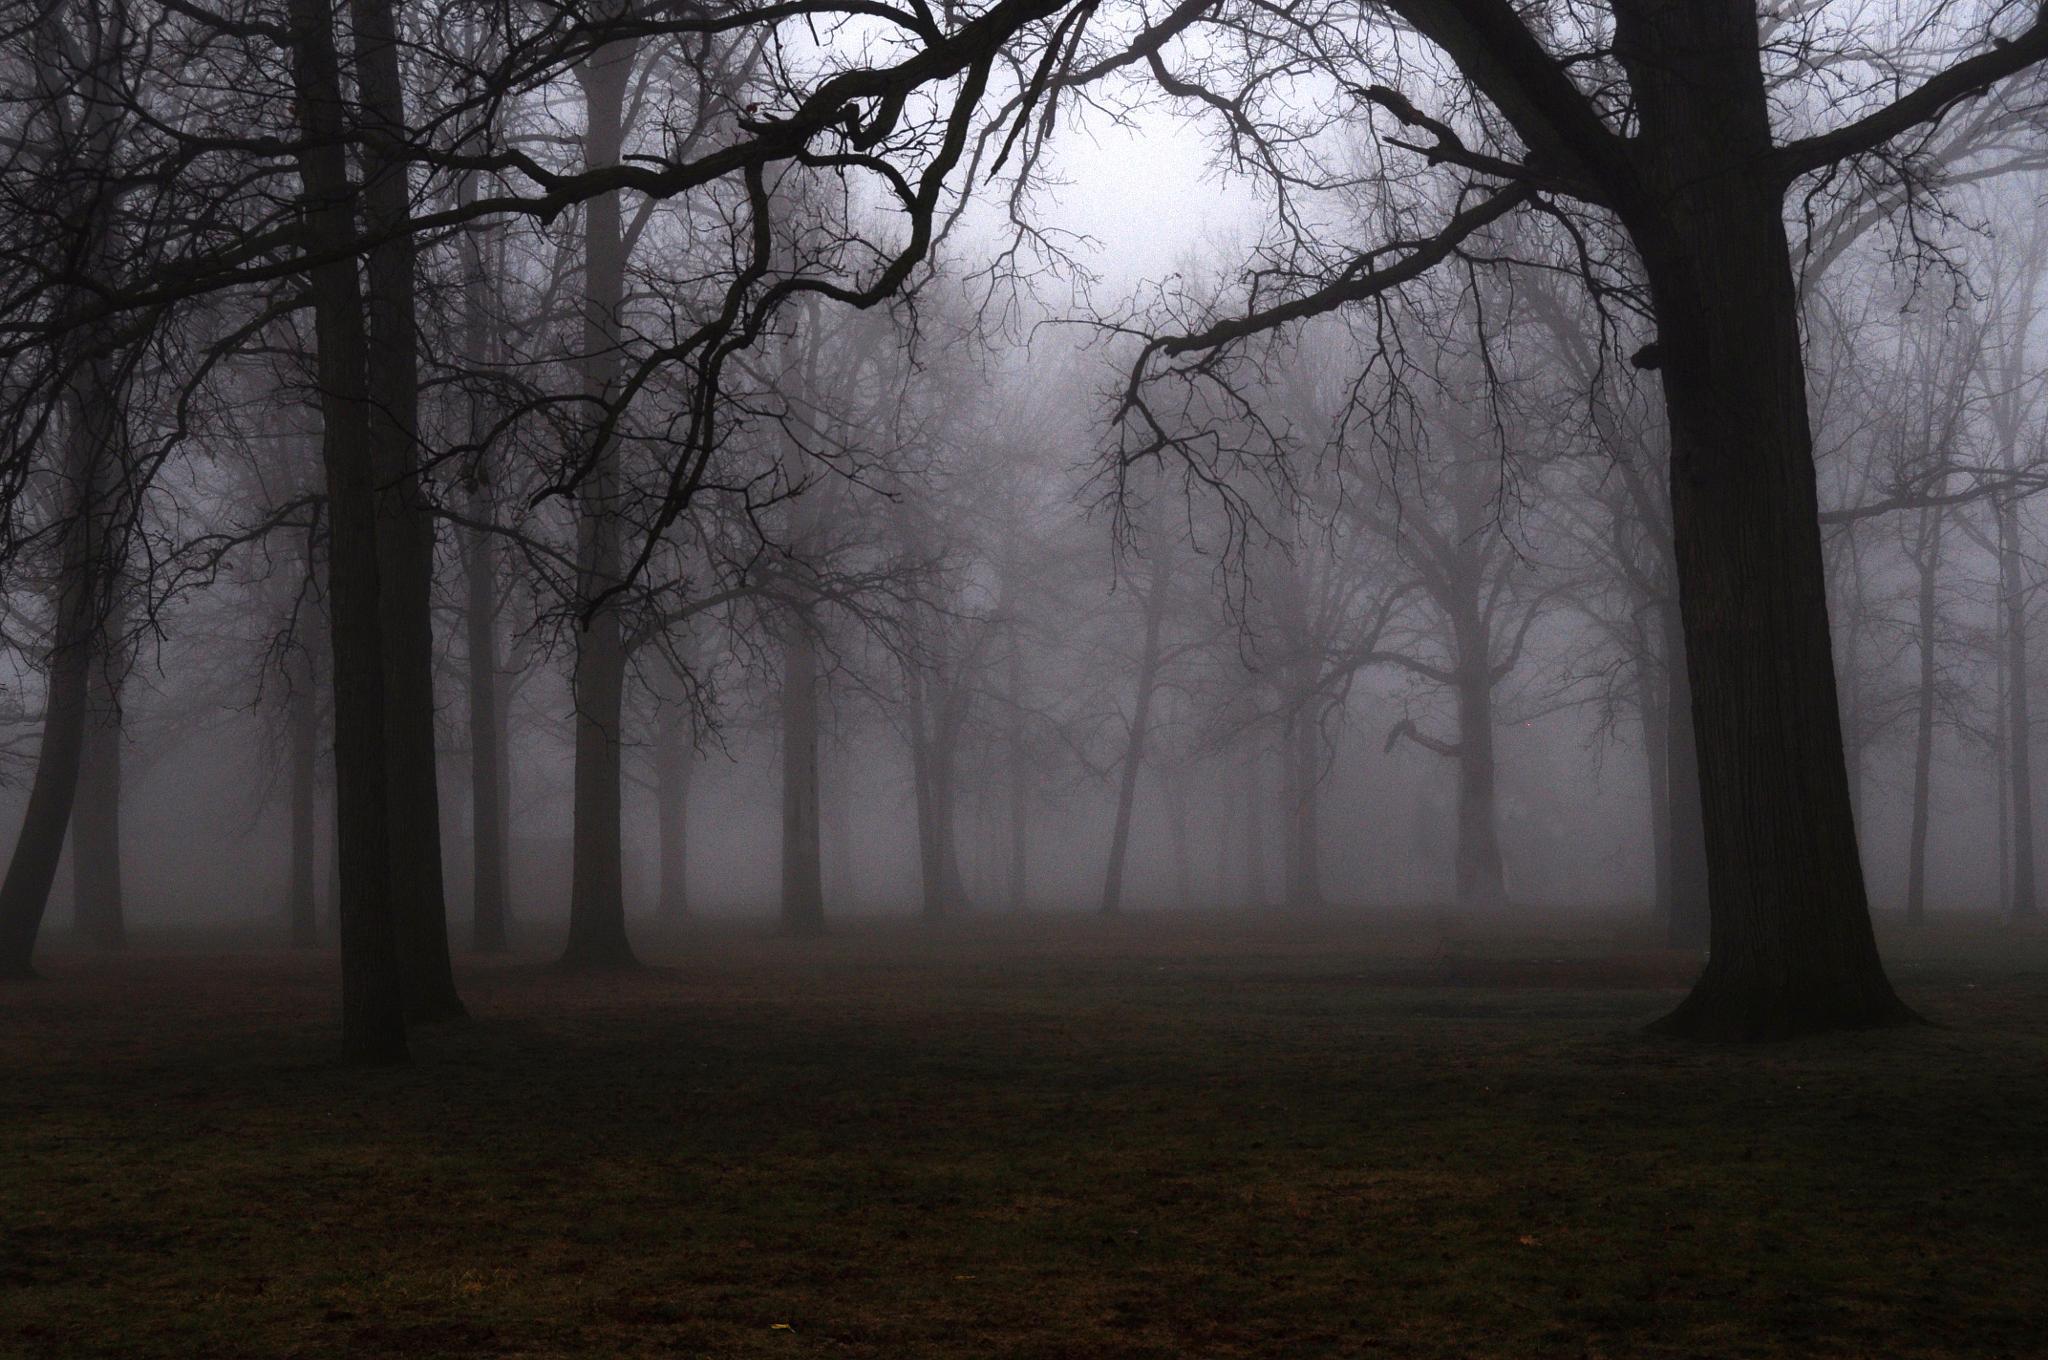 Morning fog by JanuaryFire